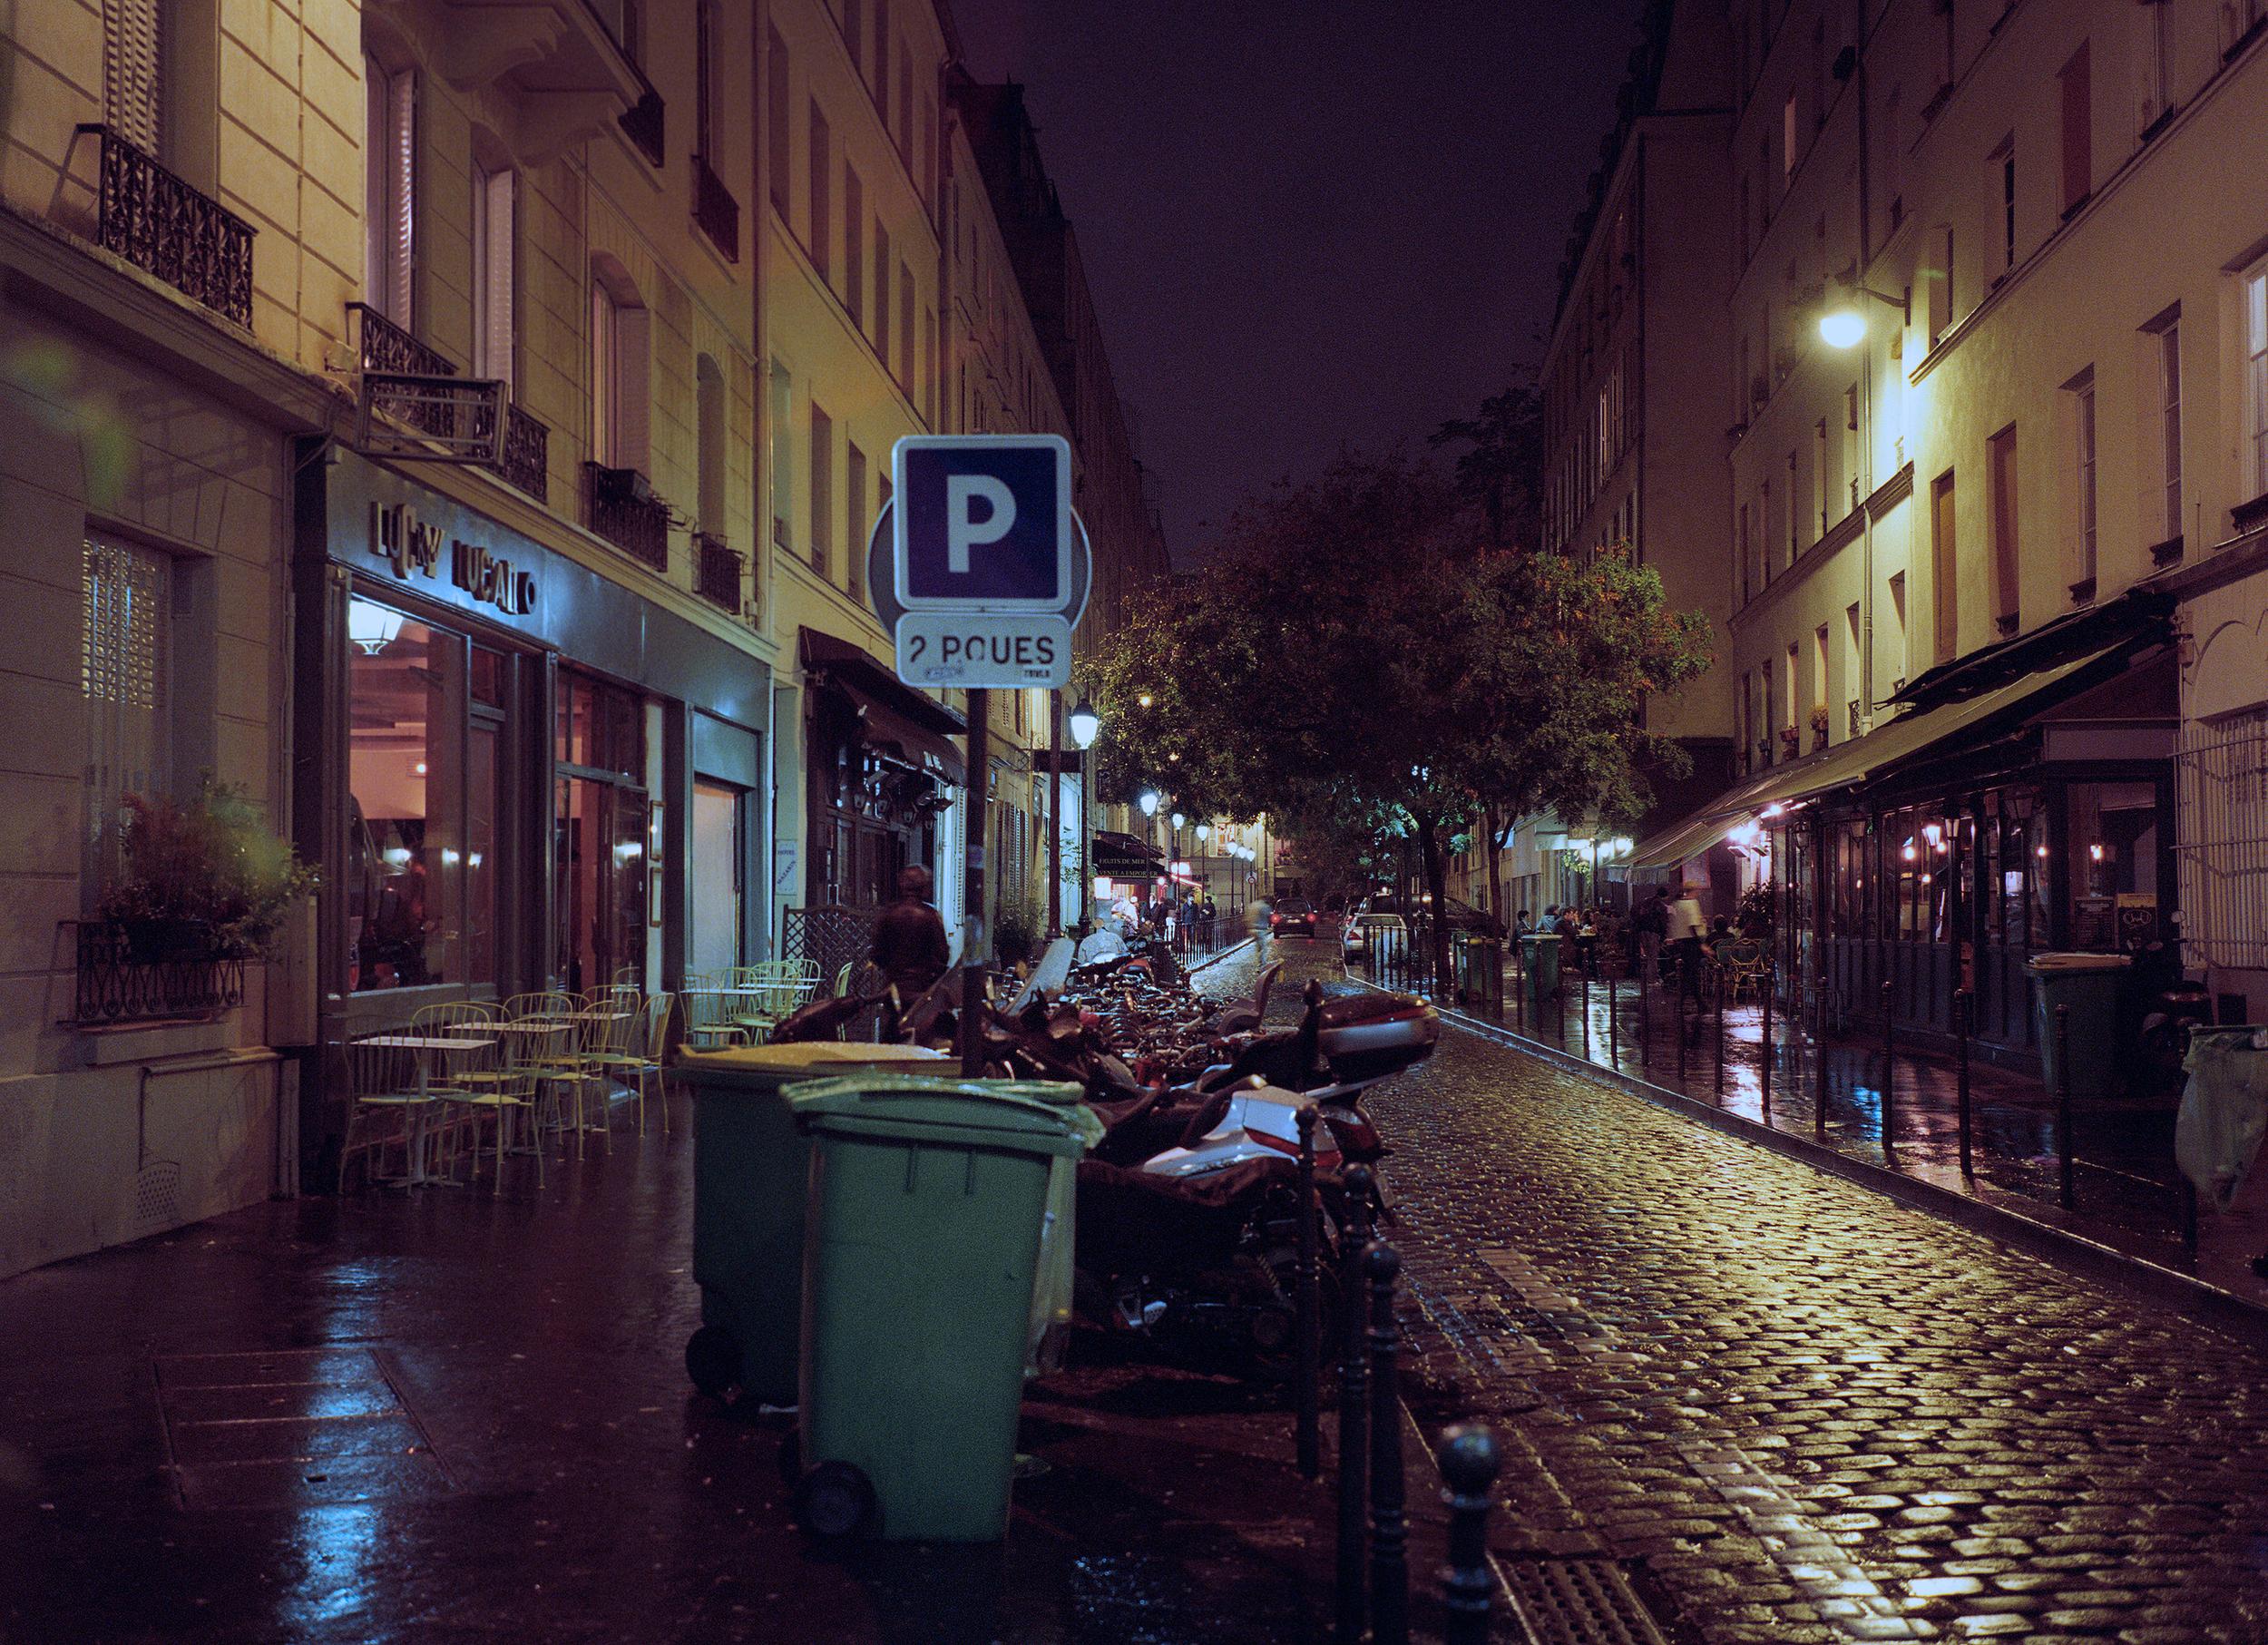 Somewhere-street.jpg